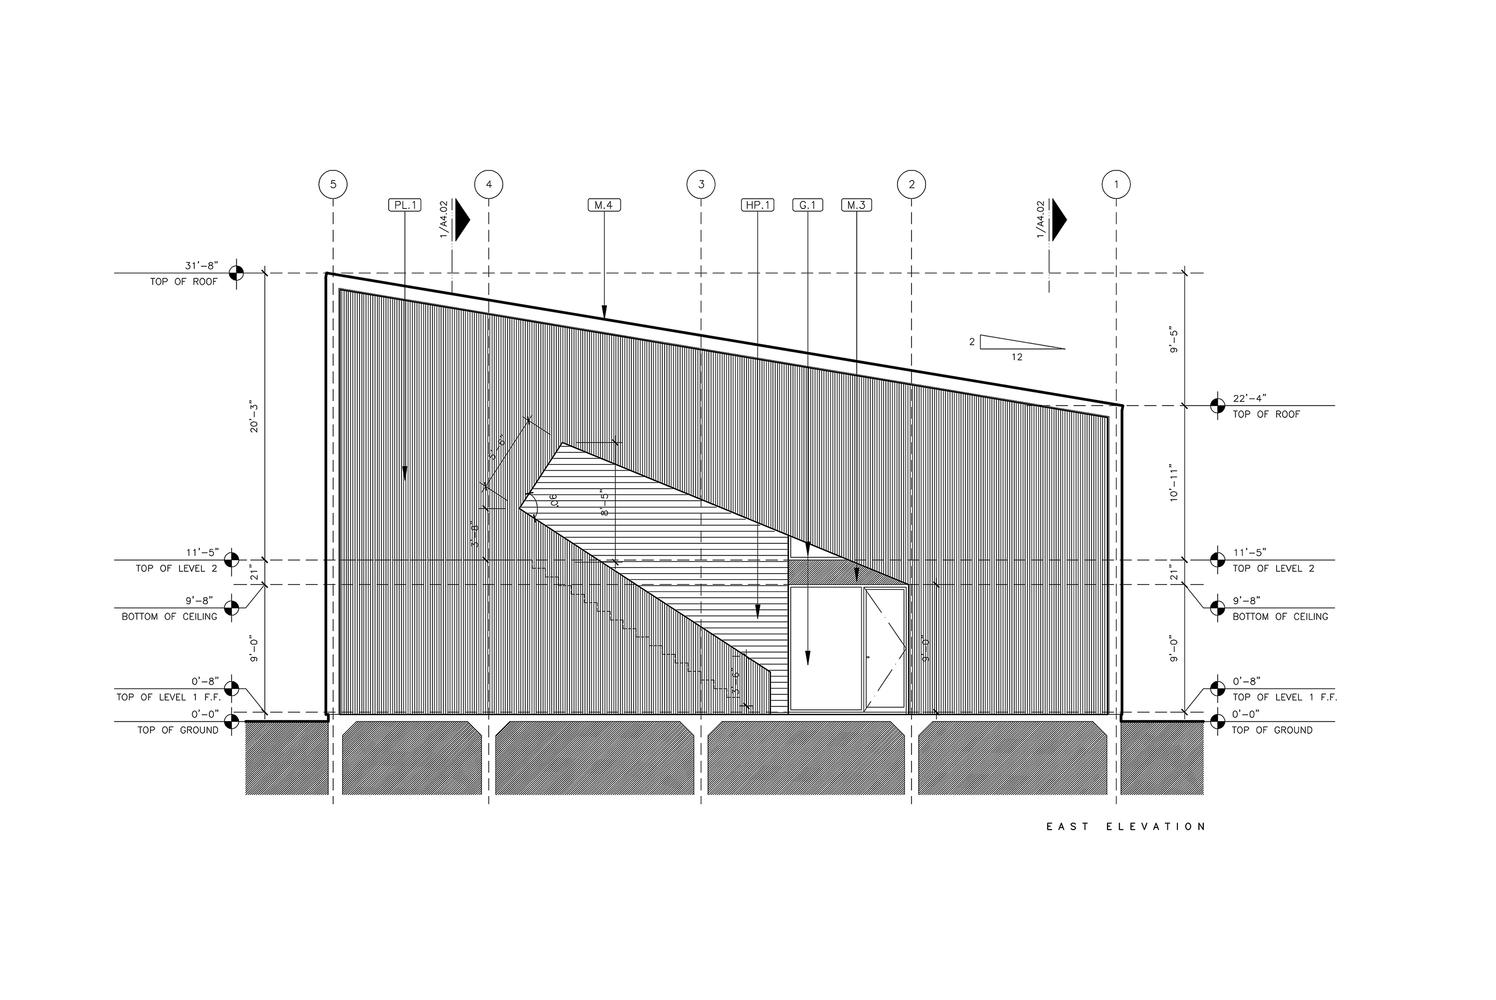 SC_Elevation_Zui_Ng.jpg